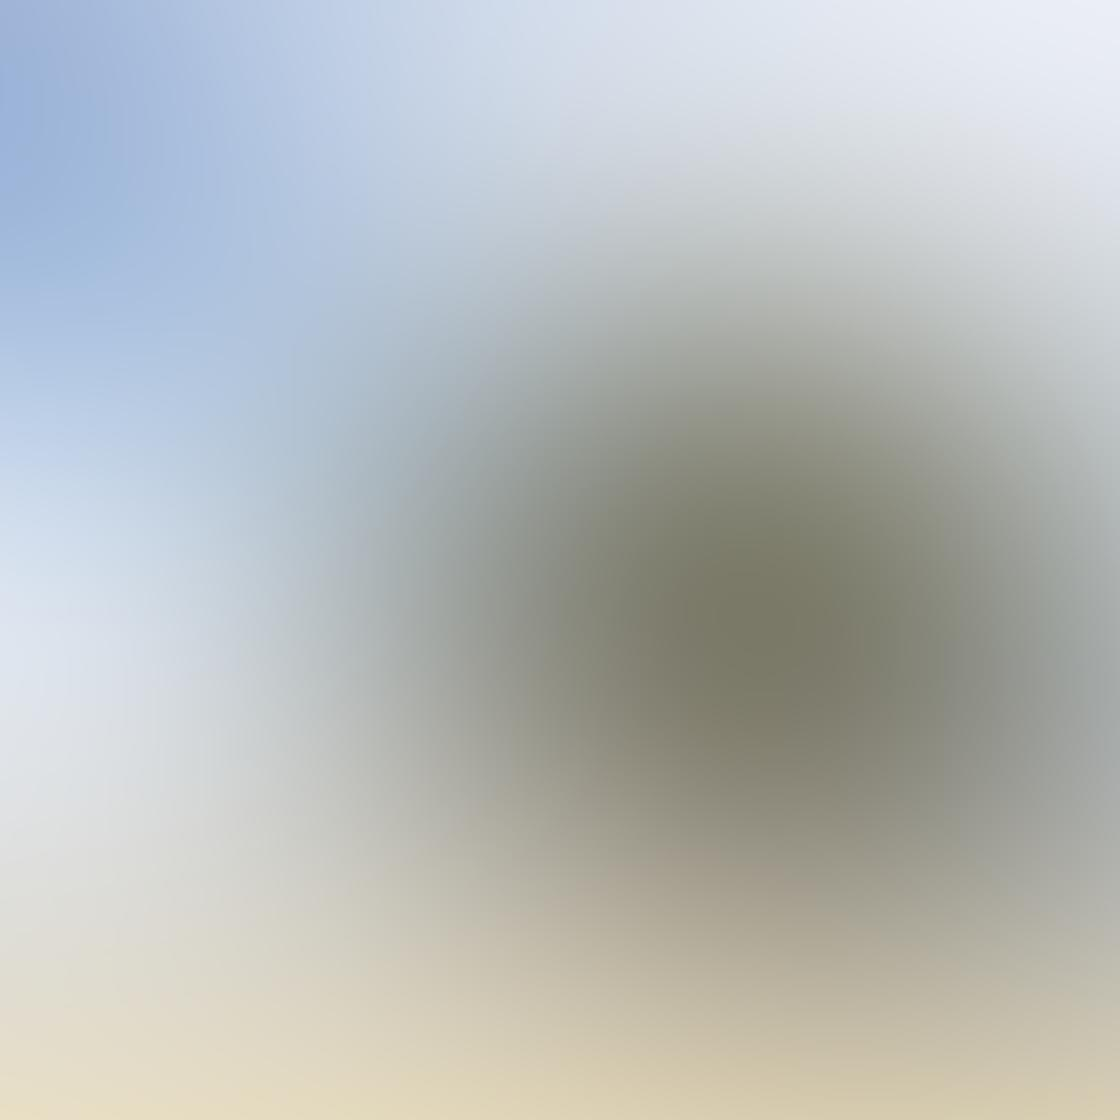 Minimalist Landscape iPhone Photos 5